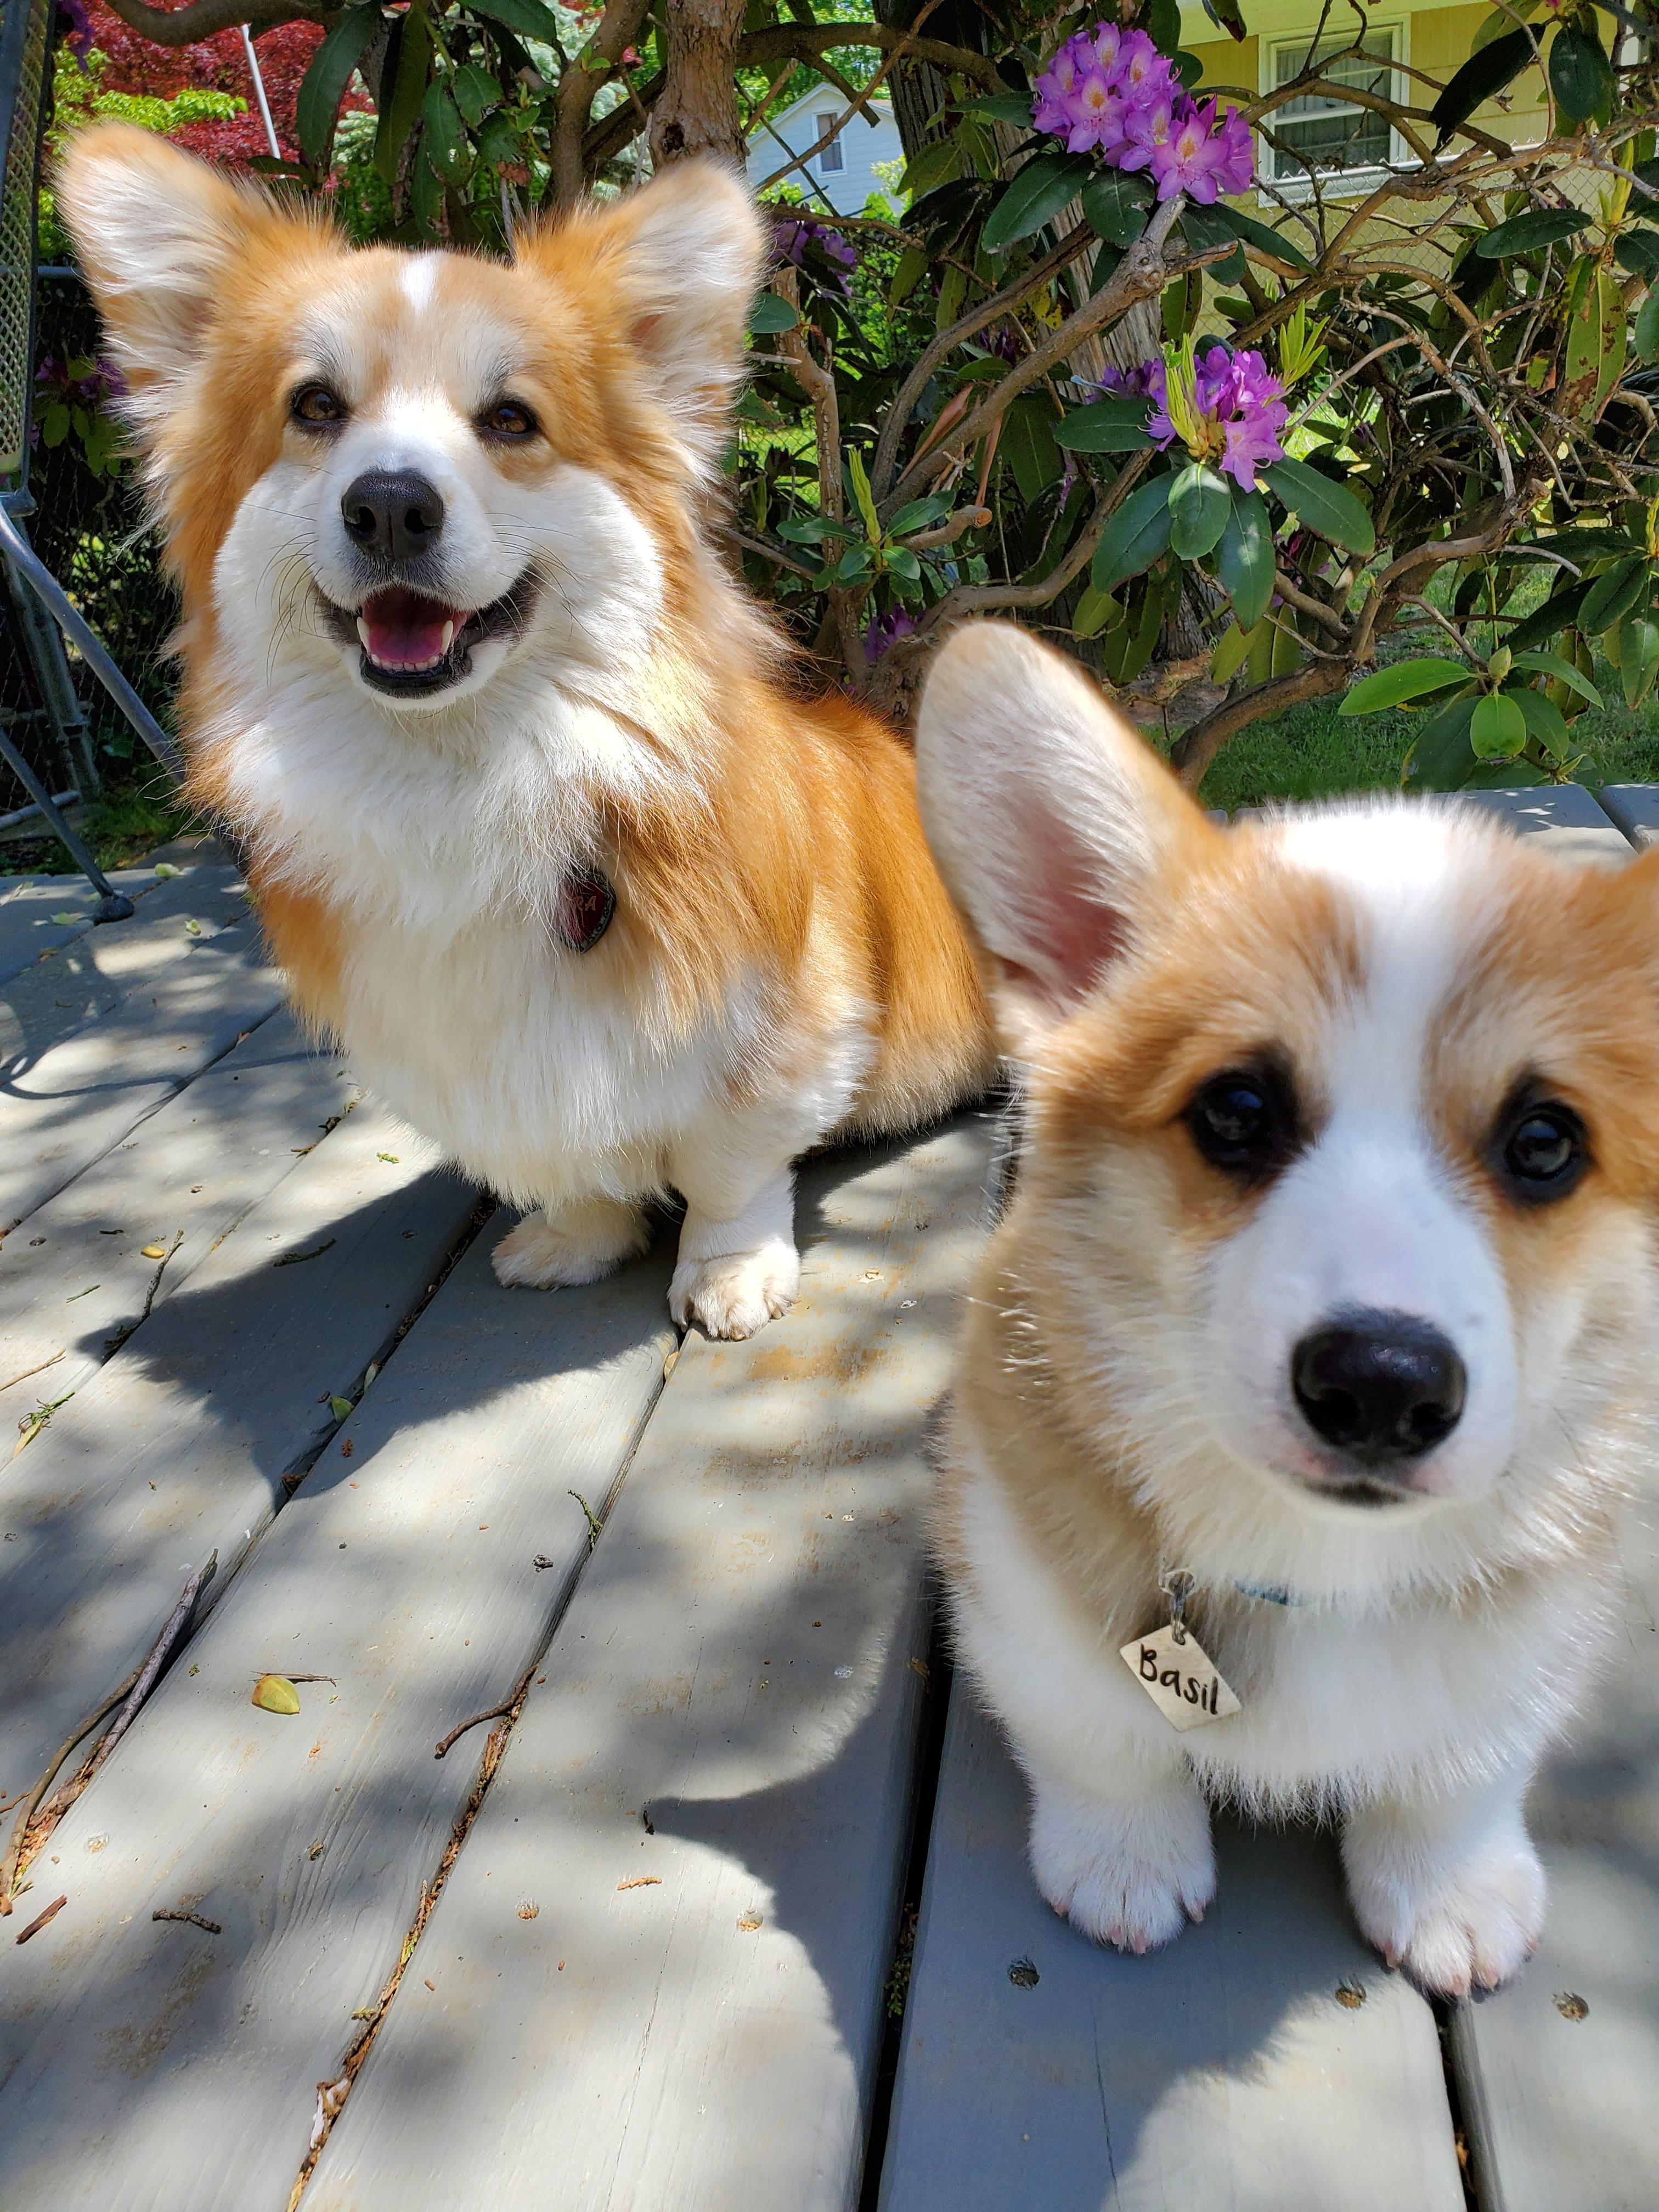 Prepare For Trouble And Make It Double Https Ift Tt 3dzlaza In 2020 Corgi Dog Corgi Dachshund Pets